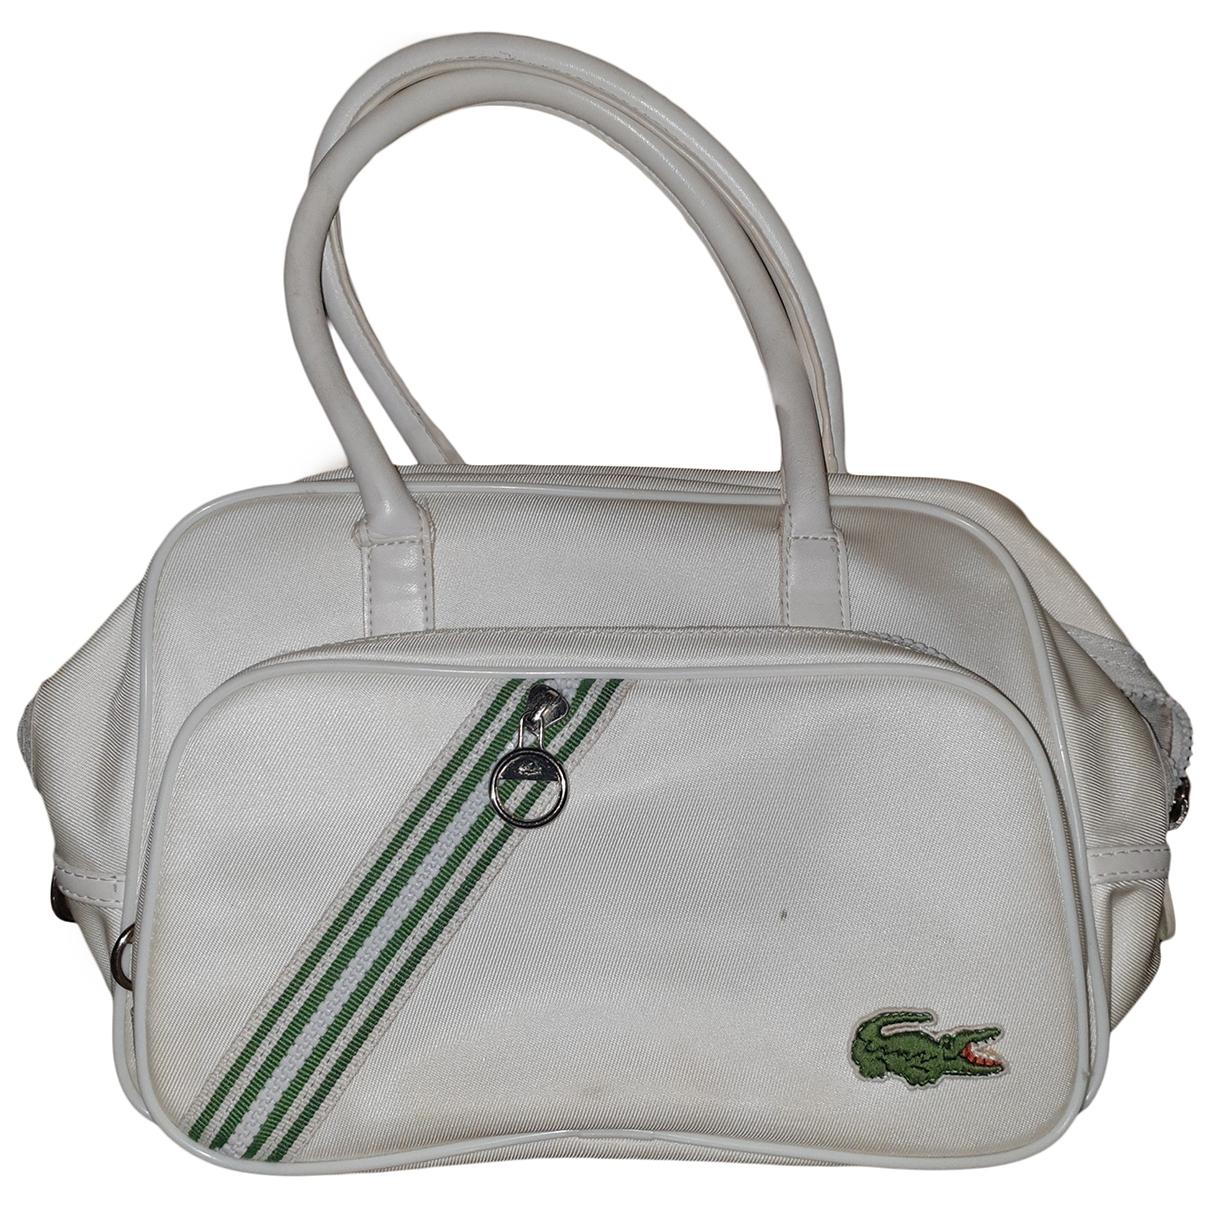 Lacoste \N White Cloth handbag for Women \N